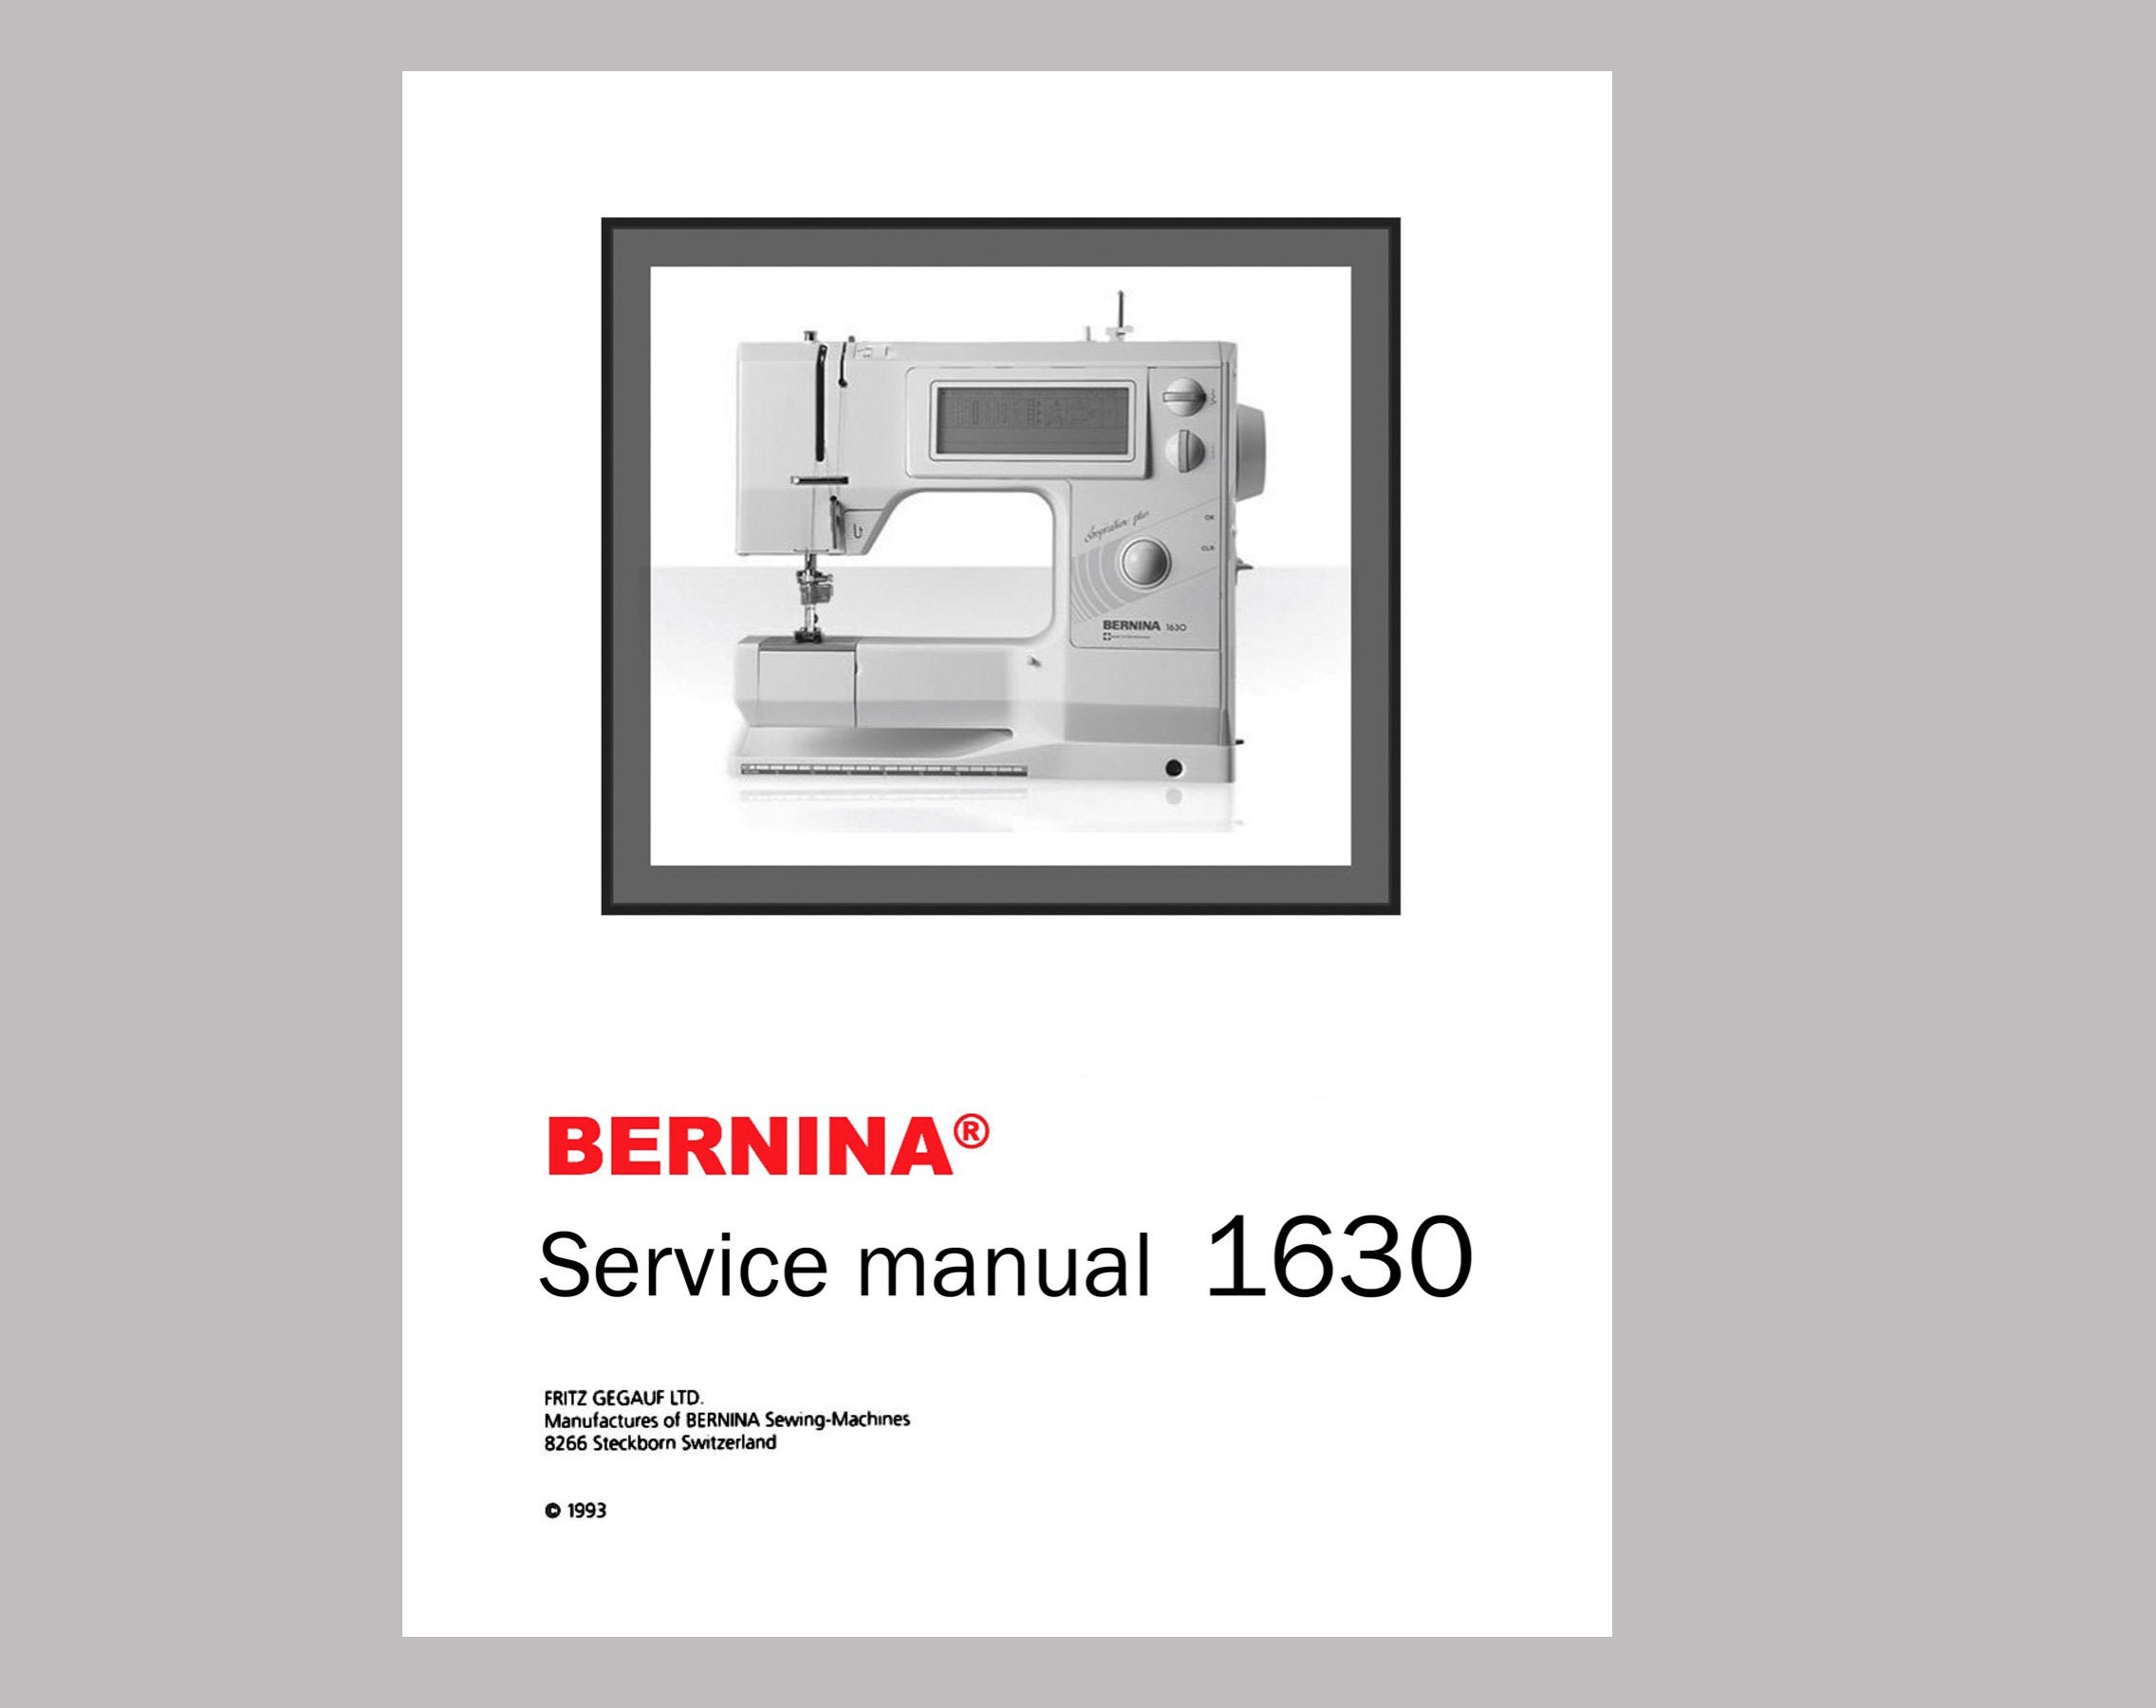 Vintage Bernina 1630 Inspiration Plus Sewing Machine Service Etsy 830 Threading Diagram